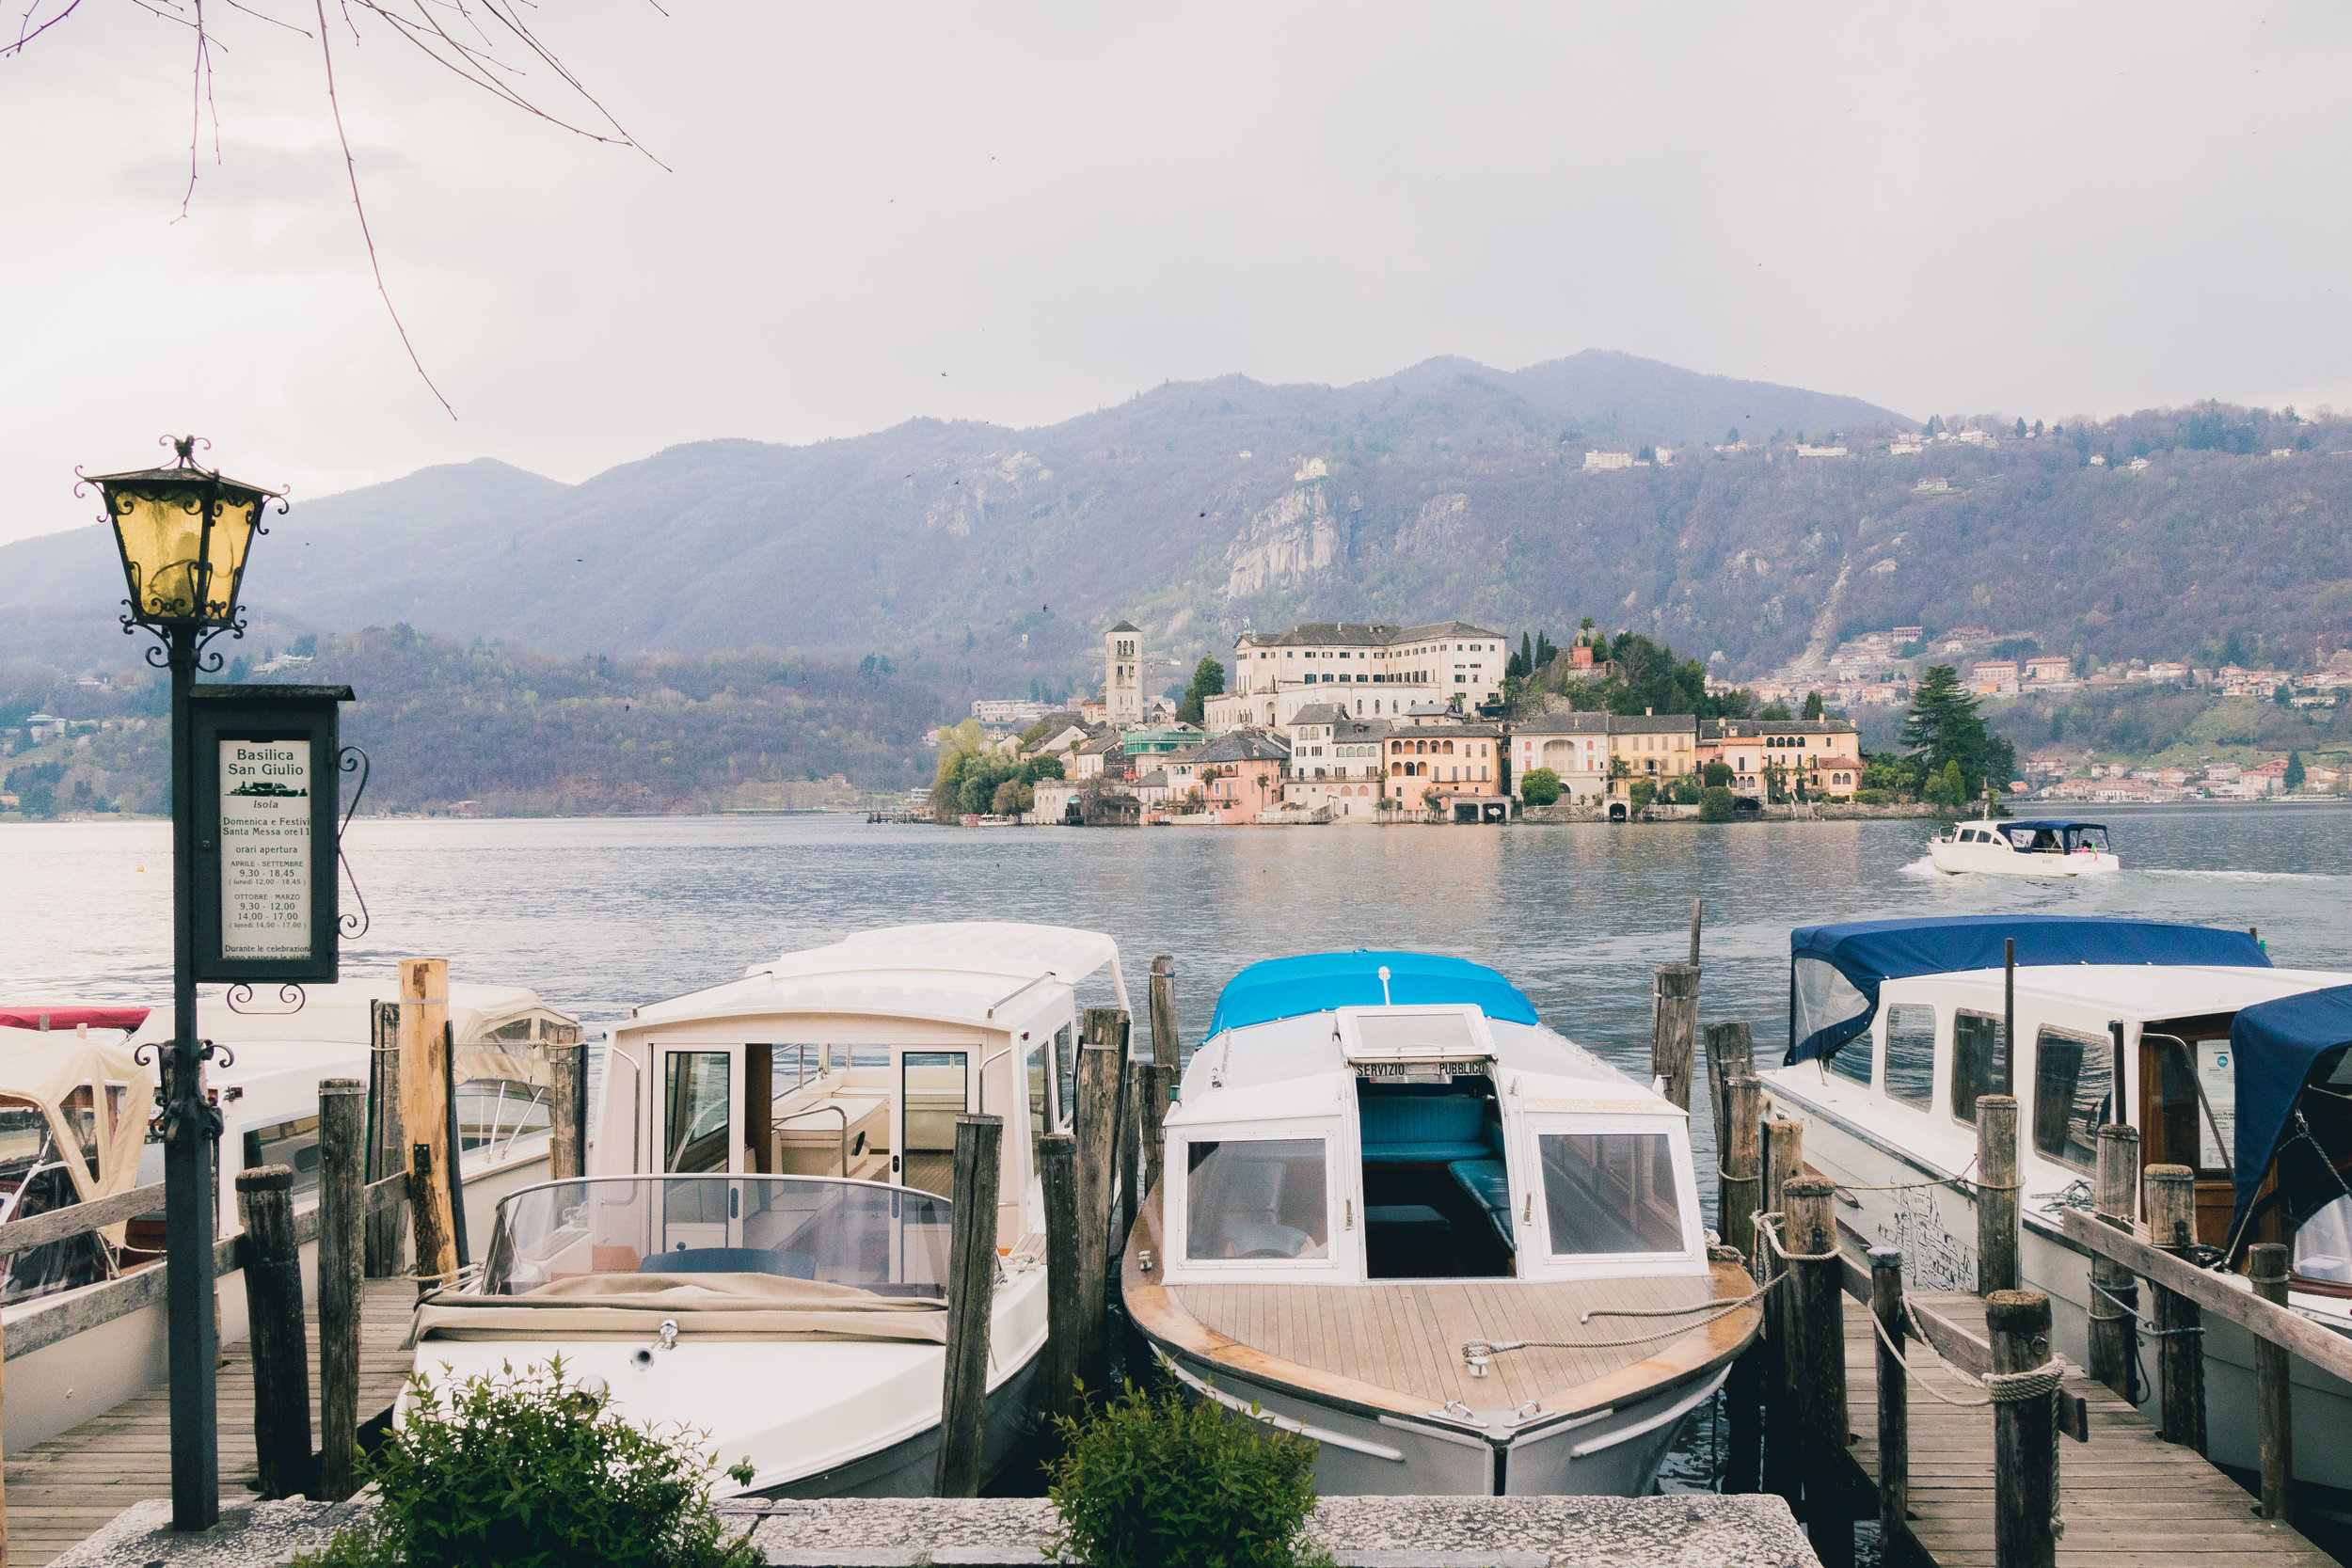 Lake_Orta_Fantini_day1-64.jpg